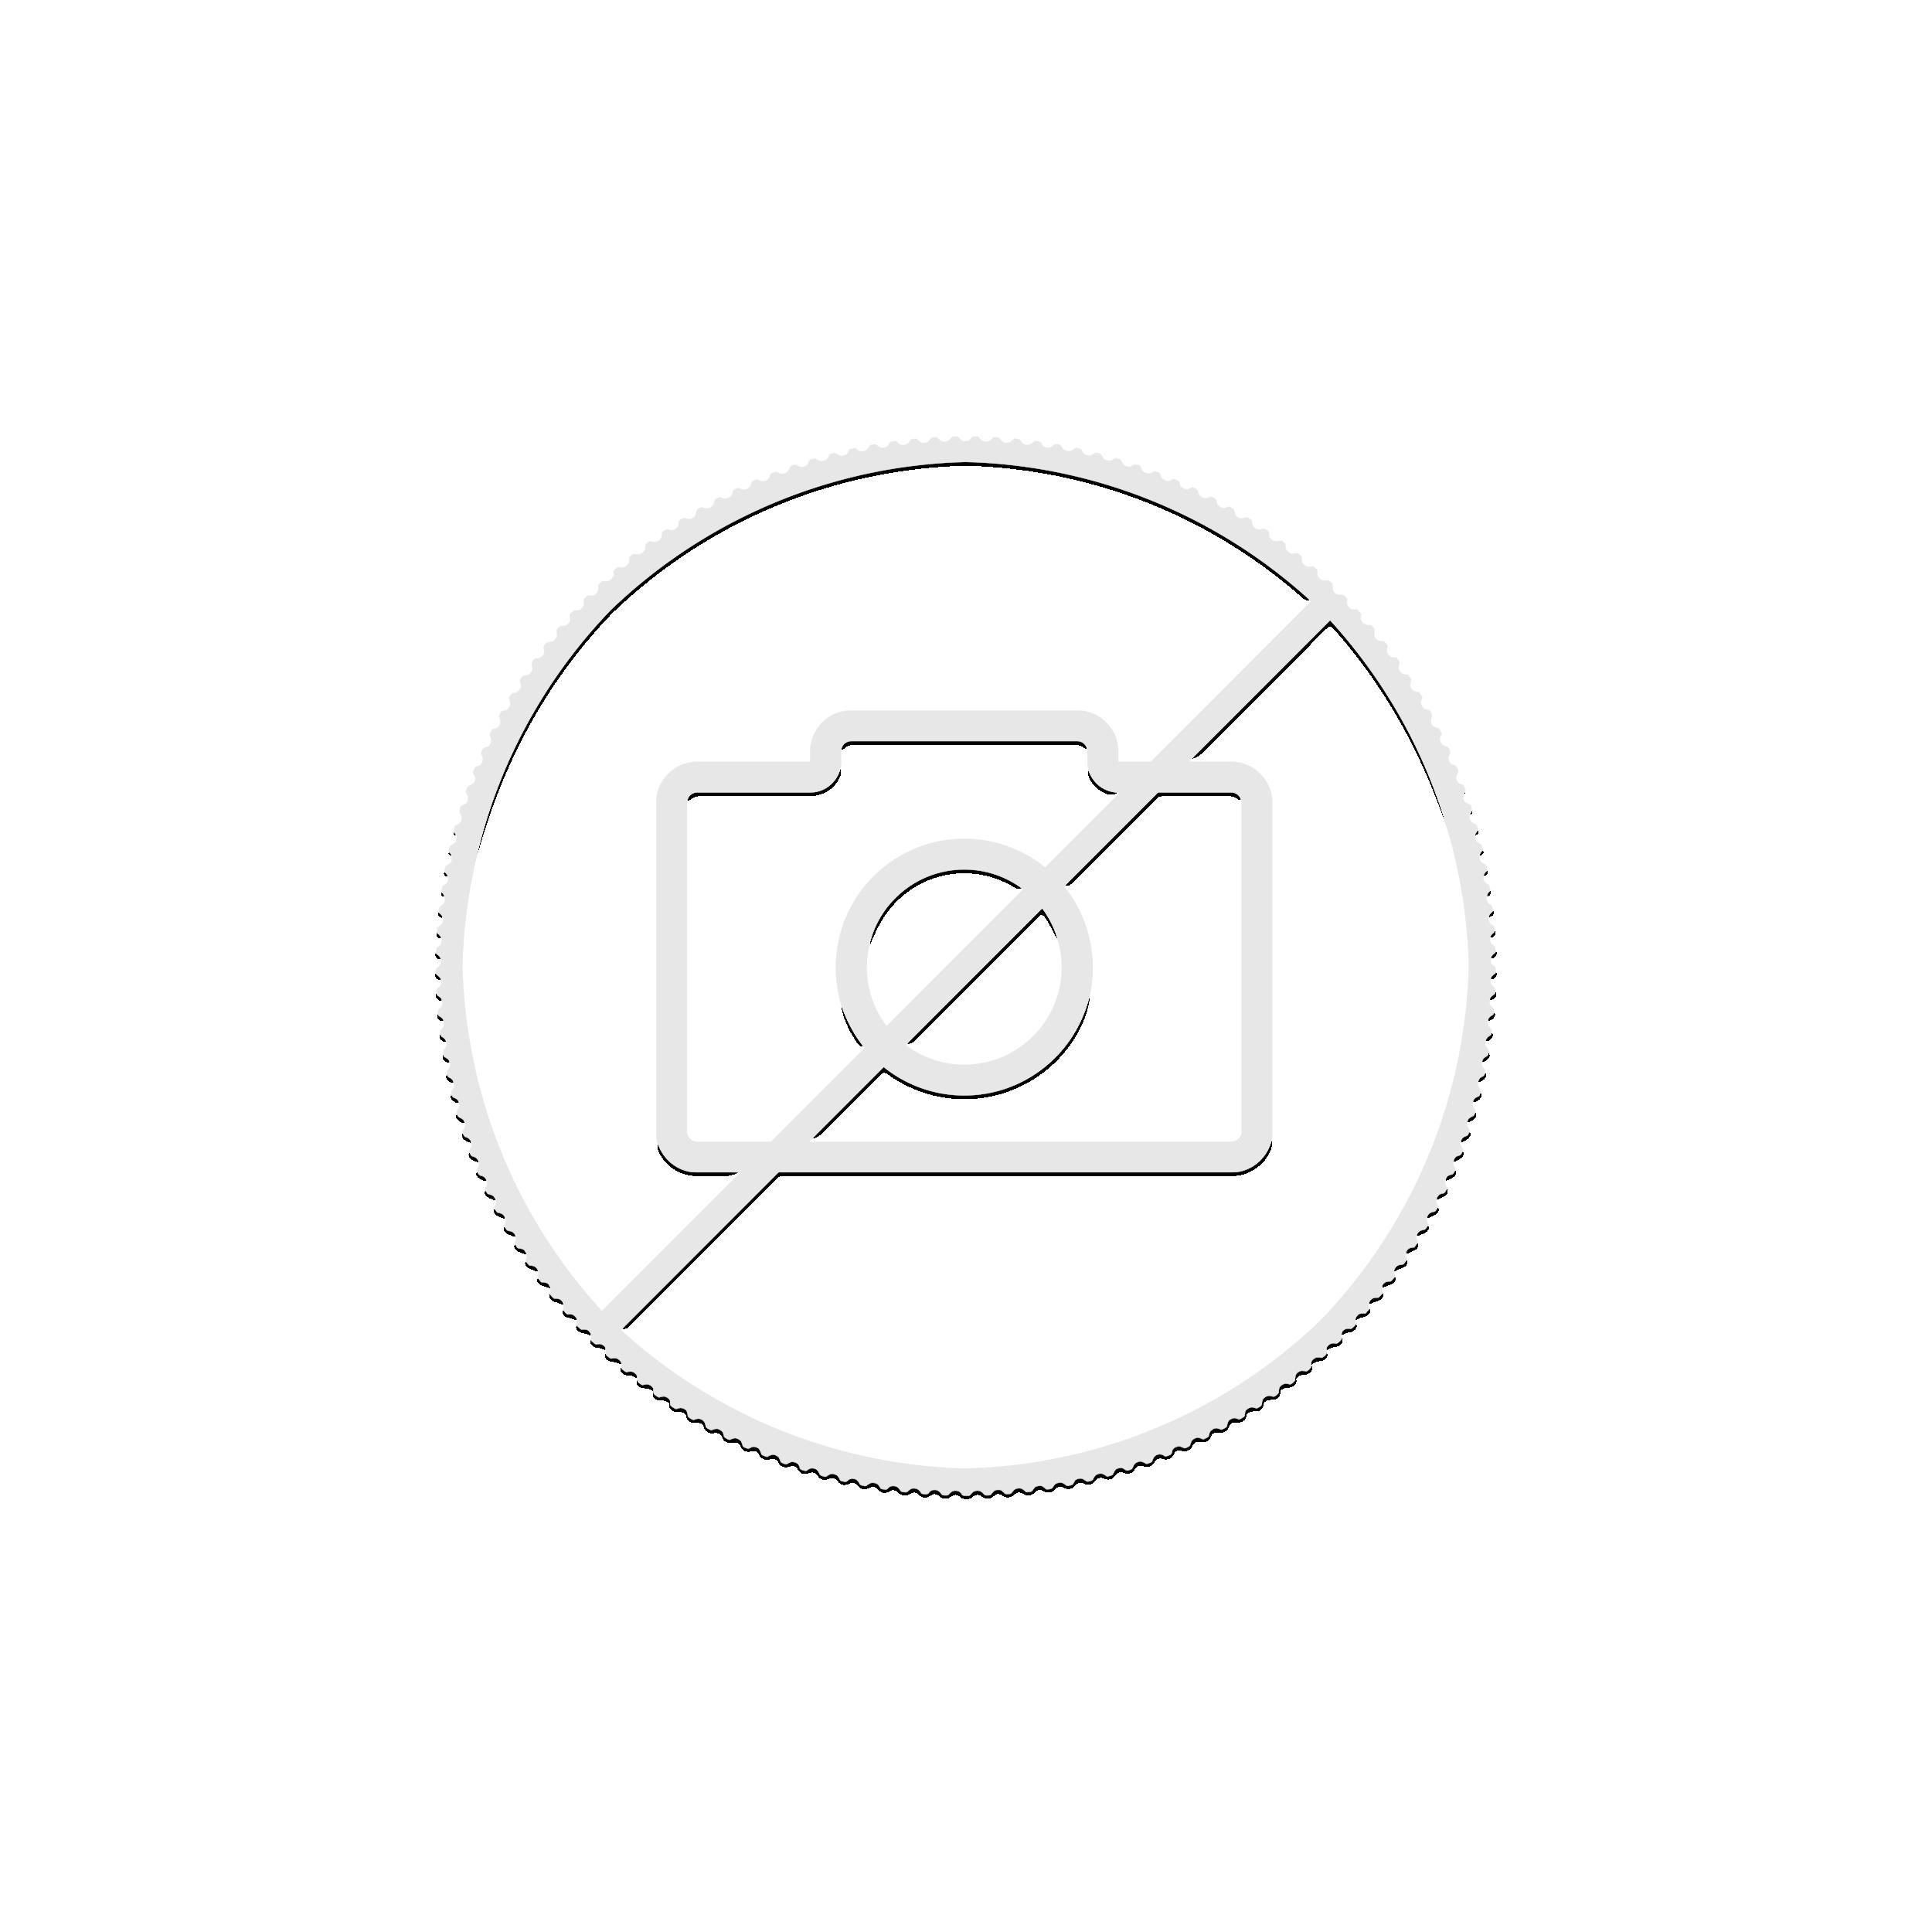 Prestige set gouden munten Krugerrand proof